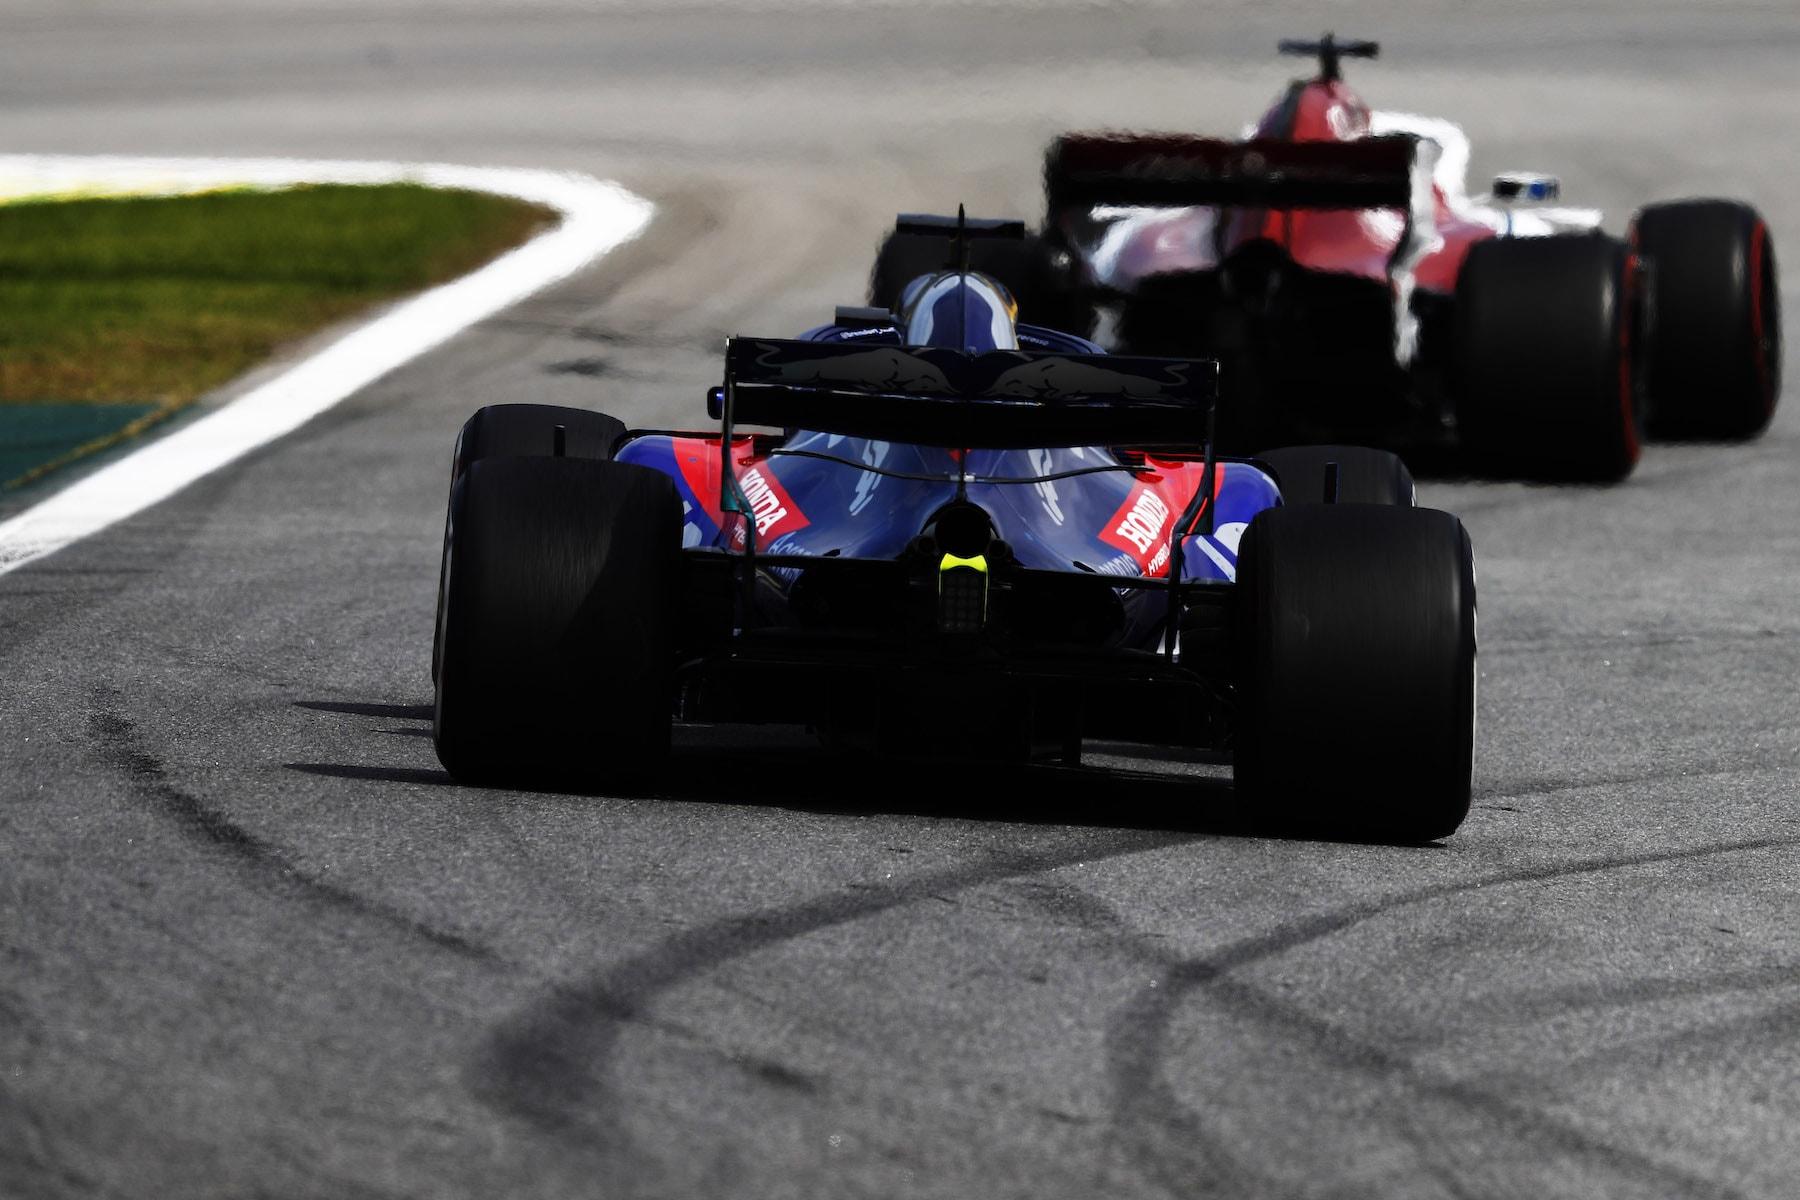 G 2018 Brendon Hartley | Toro Rosso STR13 | 2018 Brazilian GP 1 copy.jpg